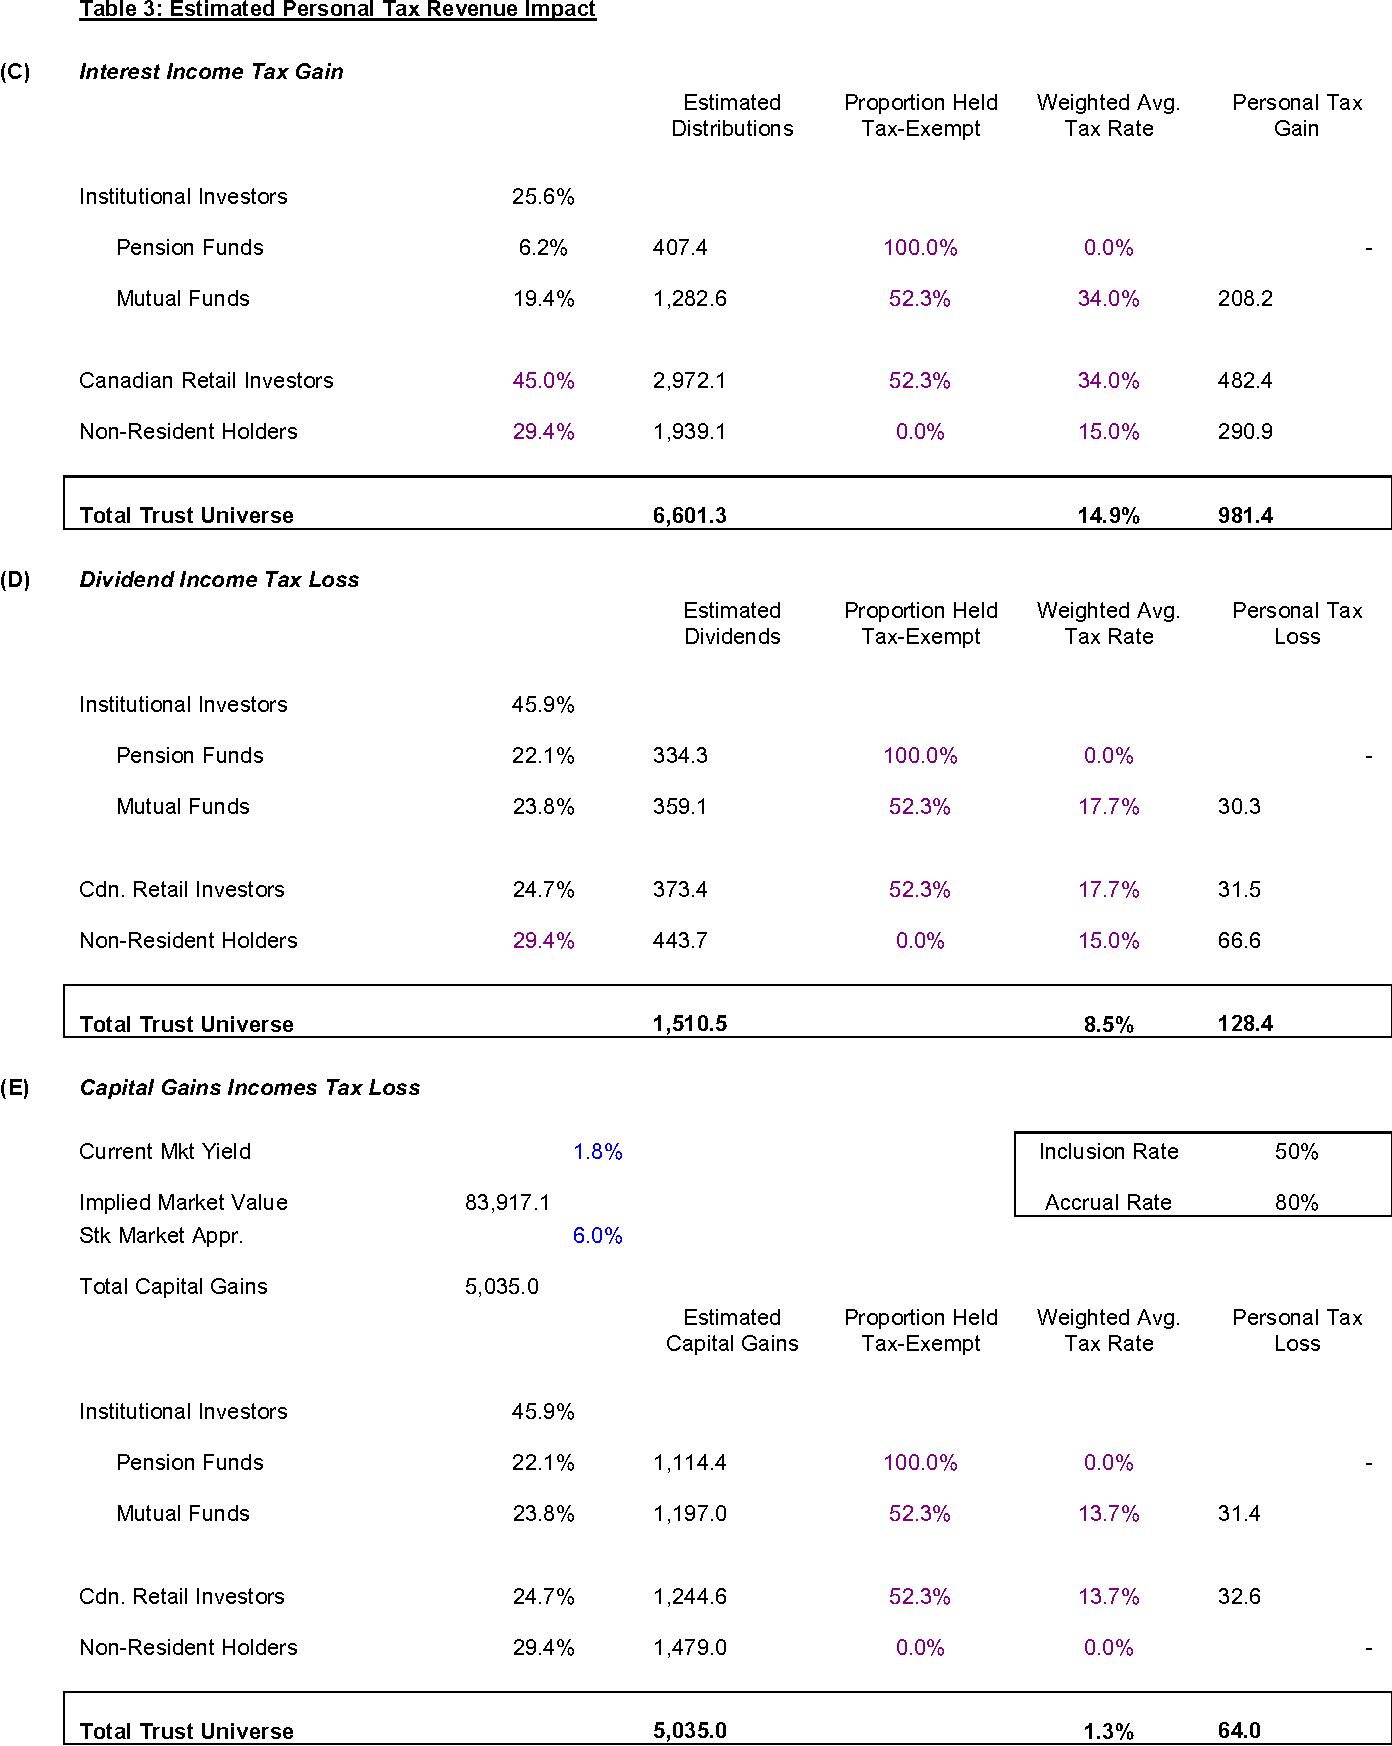 Table 3: Estimated Personal Tax Revenue Impact